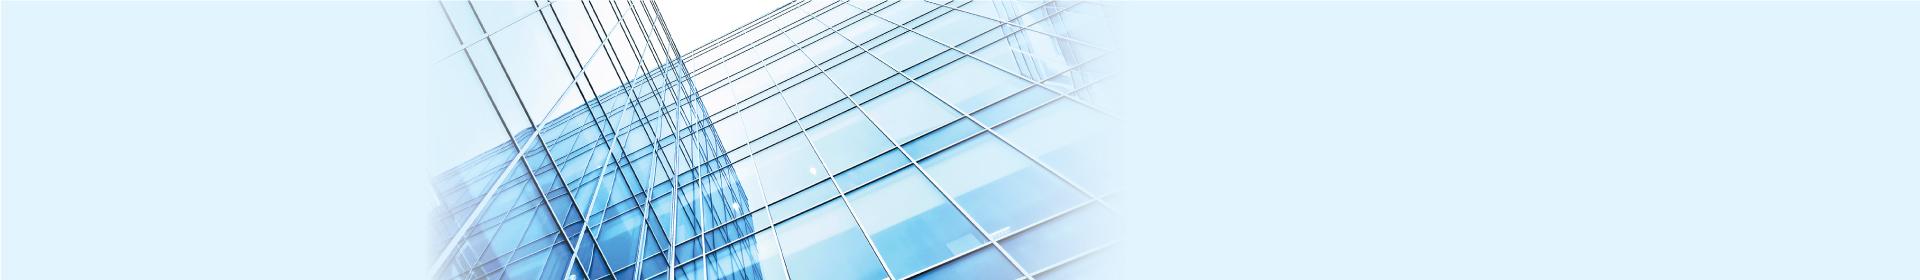 Related Companies | About us | Bank of China (Hong Kong ...